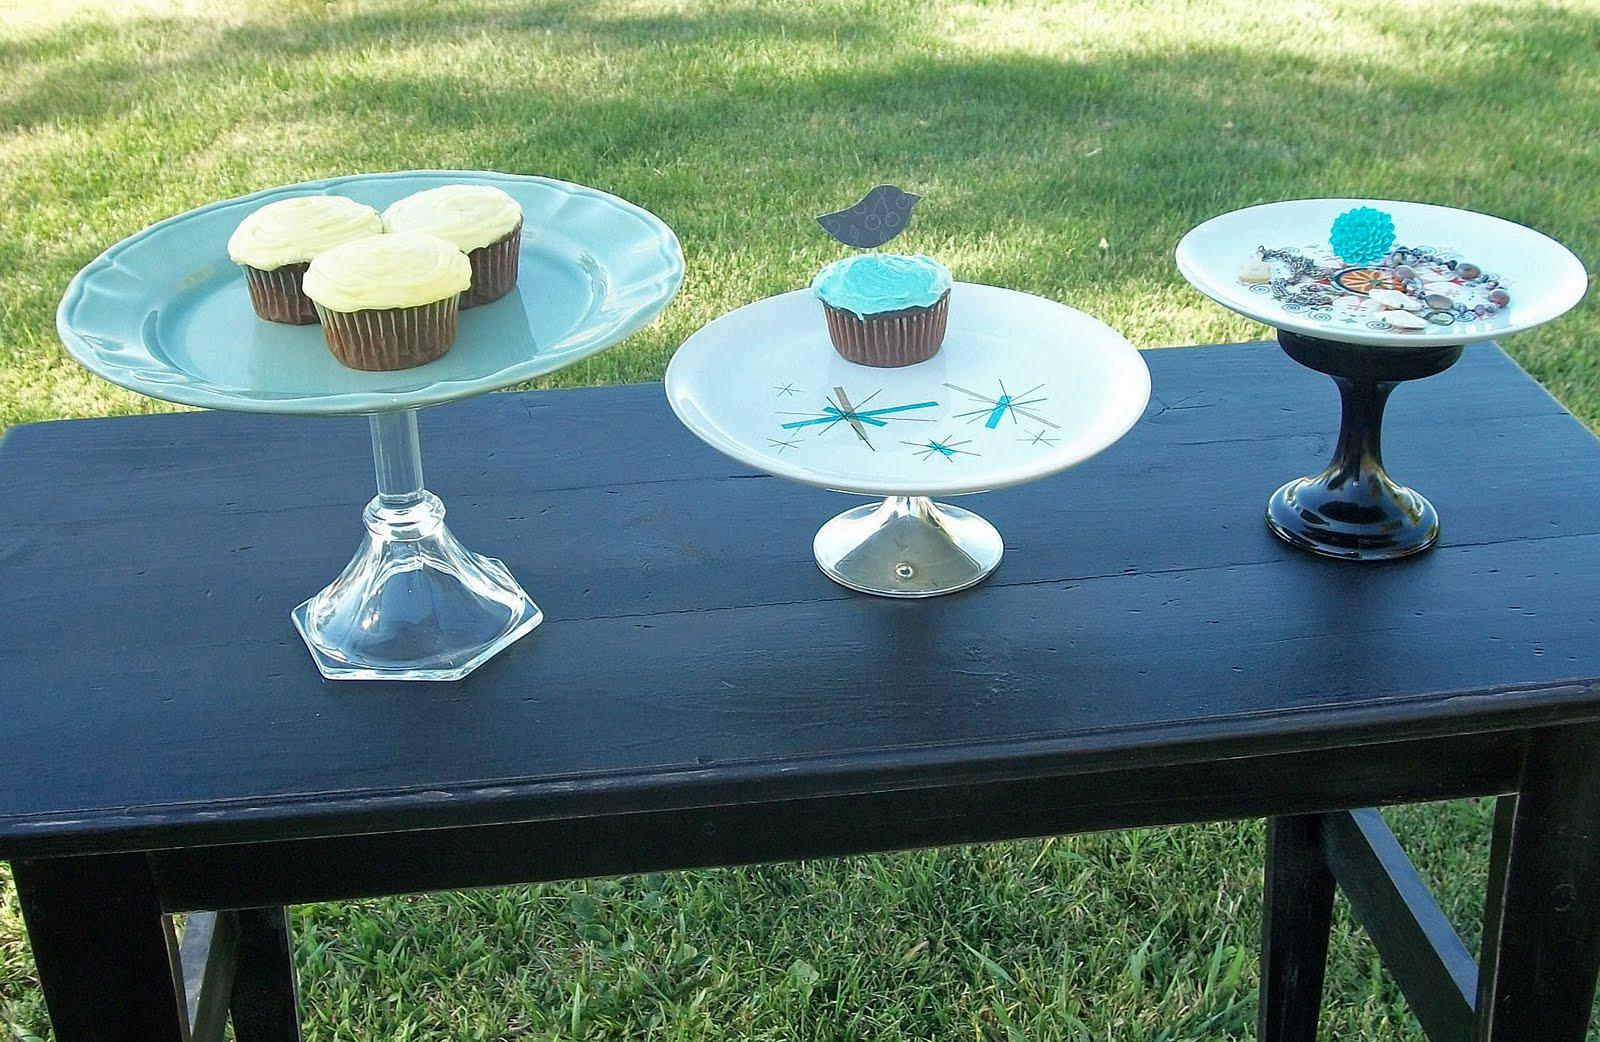 Dandelion Pickers Unique Cake Stands 4 Sale